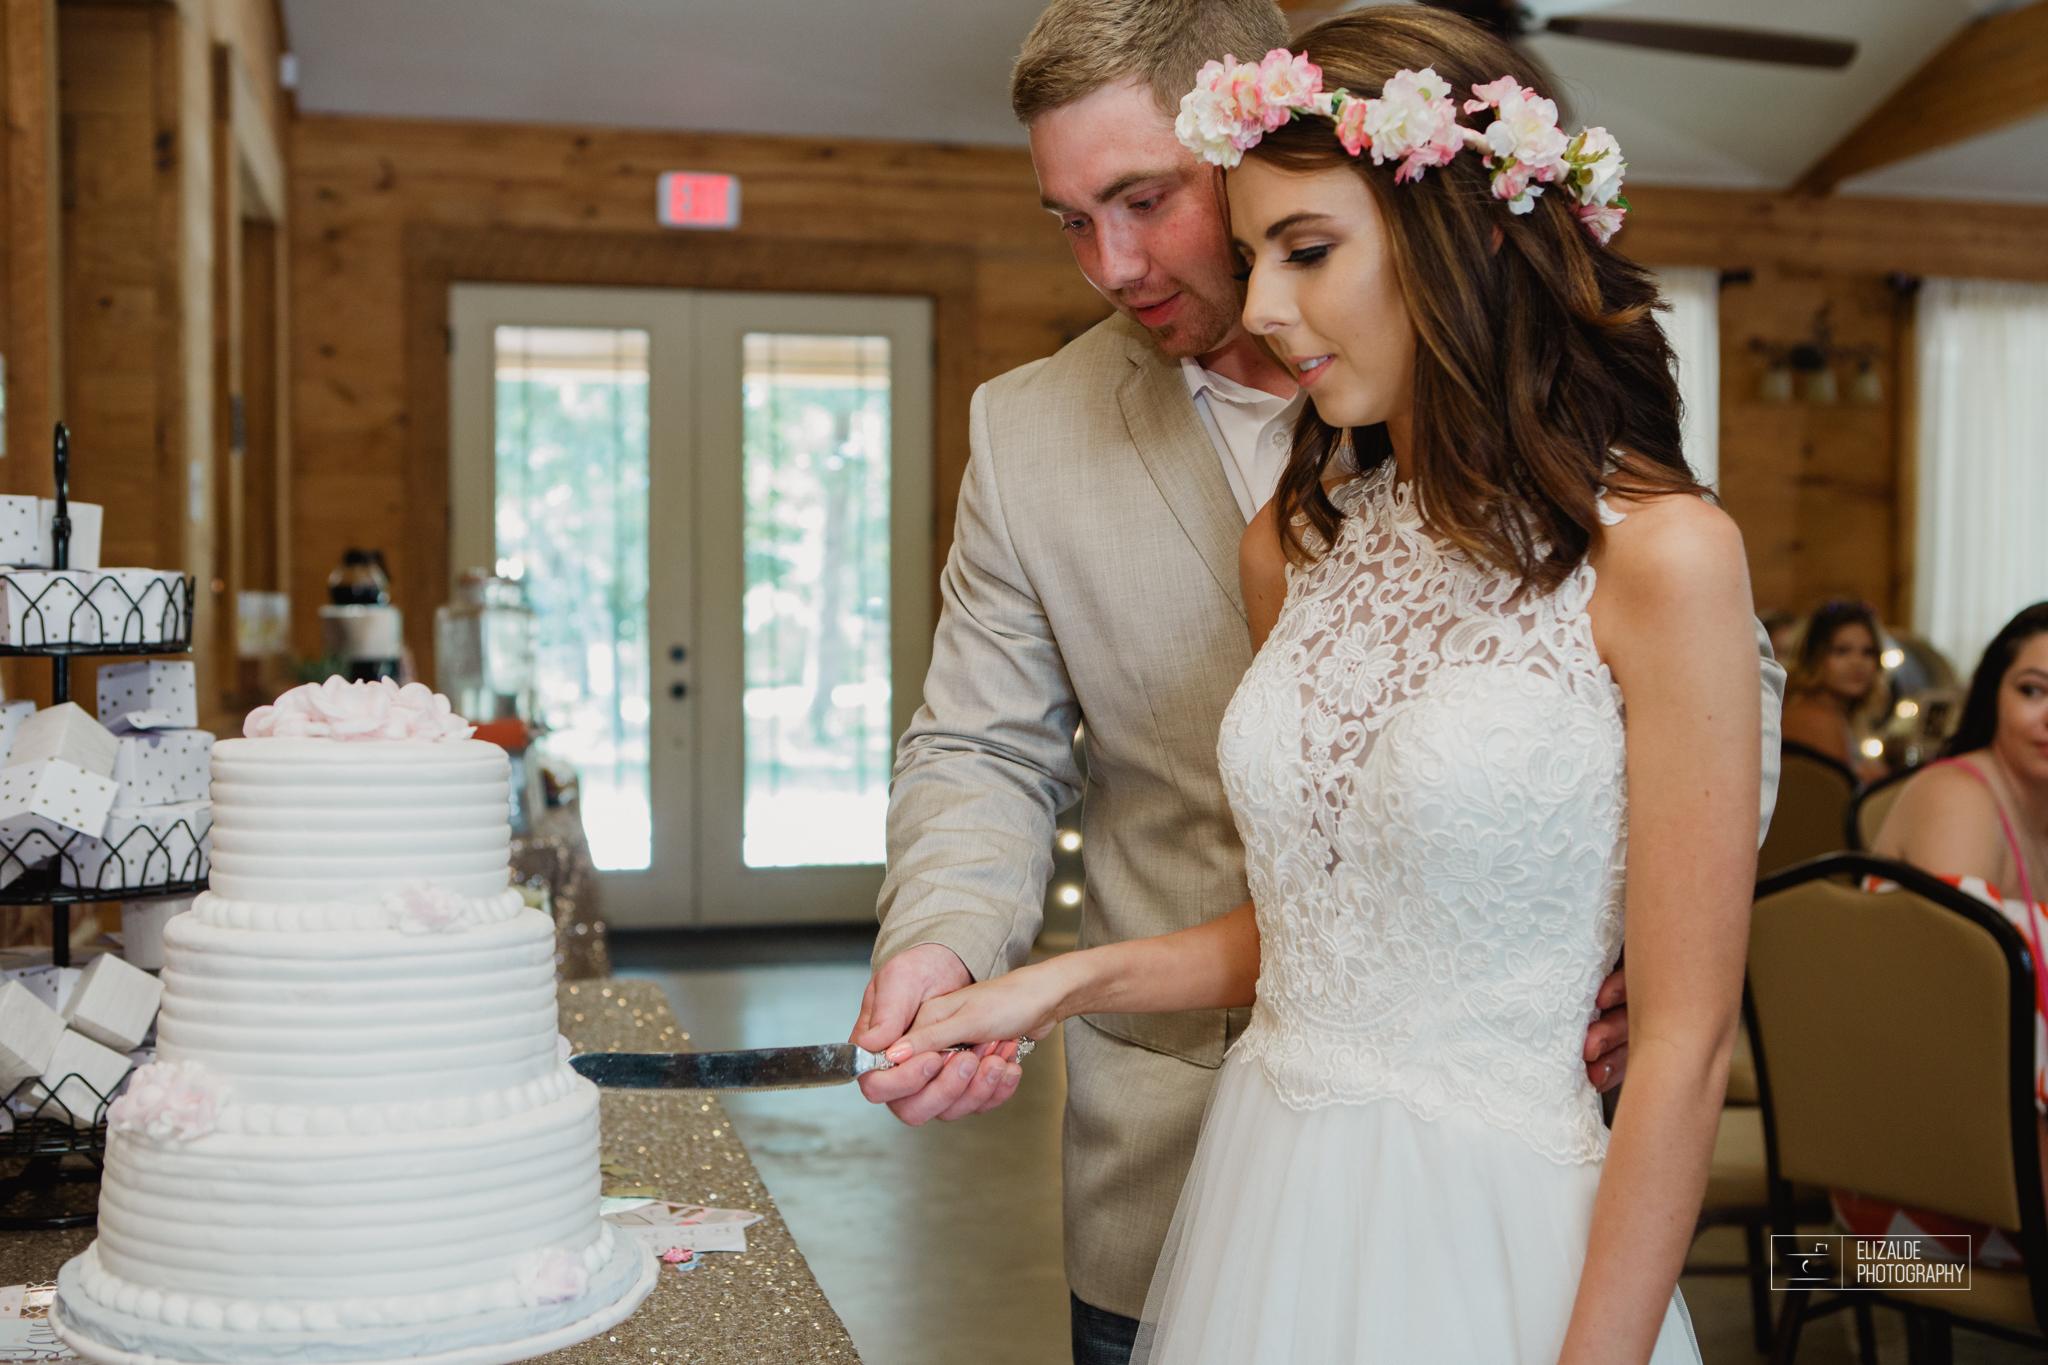 Wedding photographer Dallas_Elizalde Photography_DFW Wedding photographer_ Hickoty Hills_Wedding Photography (70 of 90).jpg